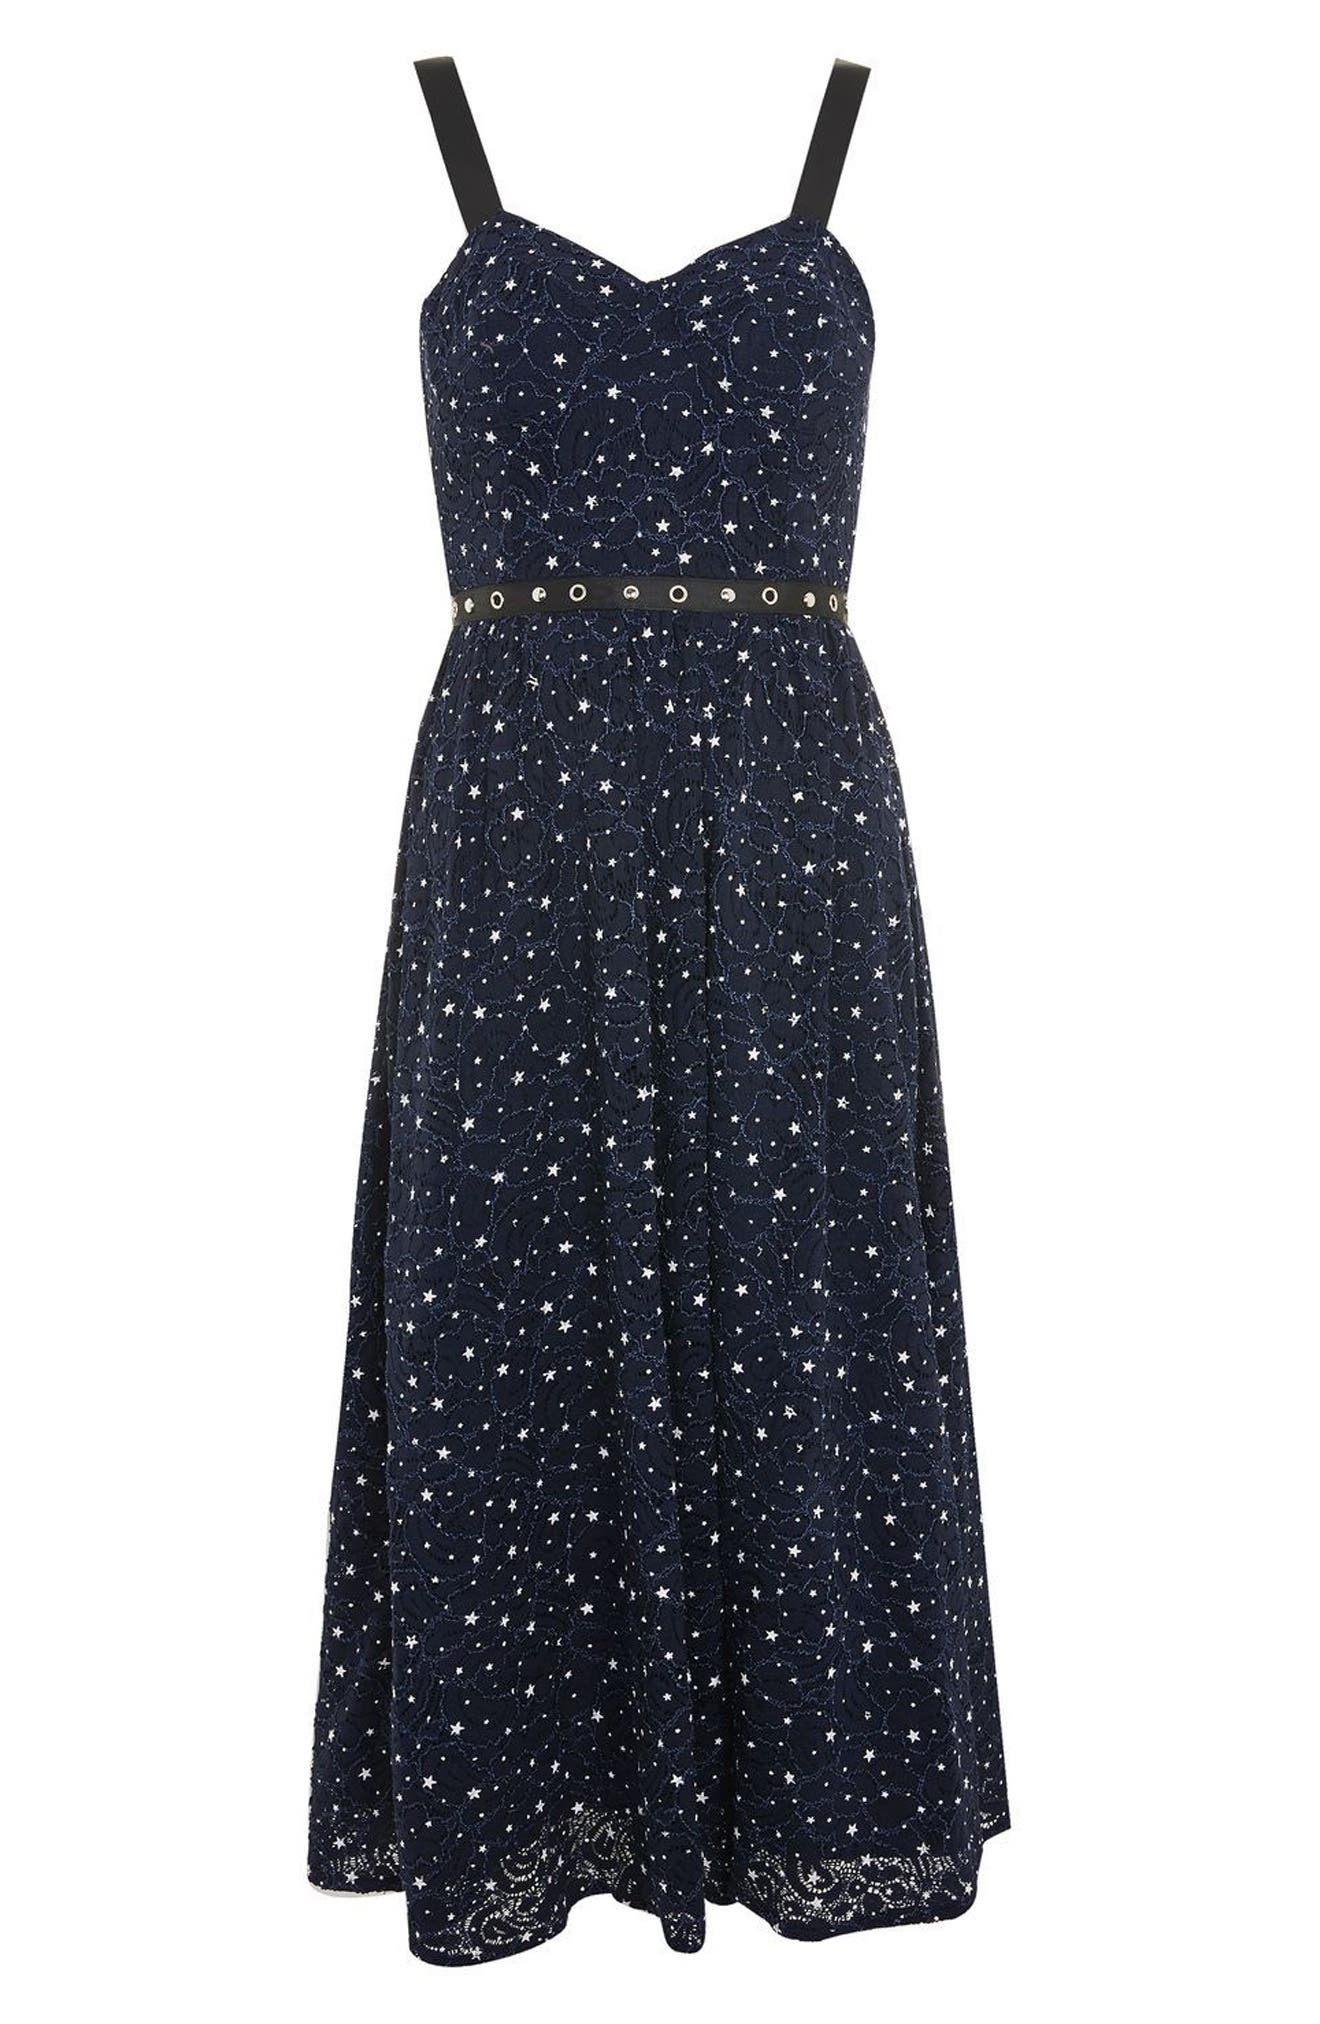 Star Lace Bustier Midi Dress,                             Alternate thumbnail 3, color,                             Navy Blue Multi